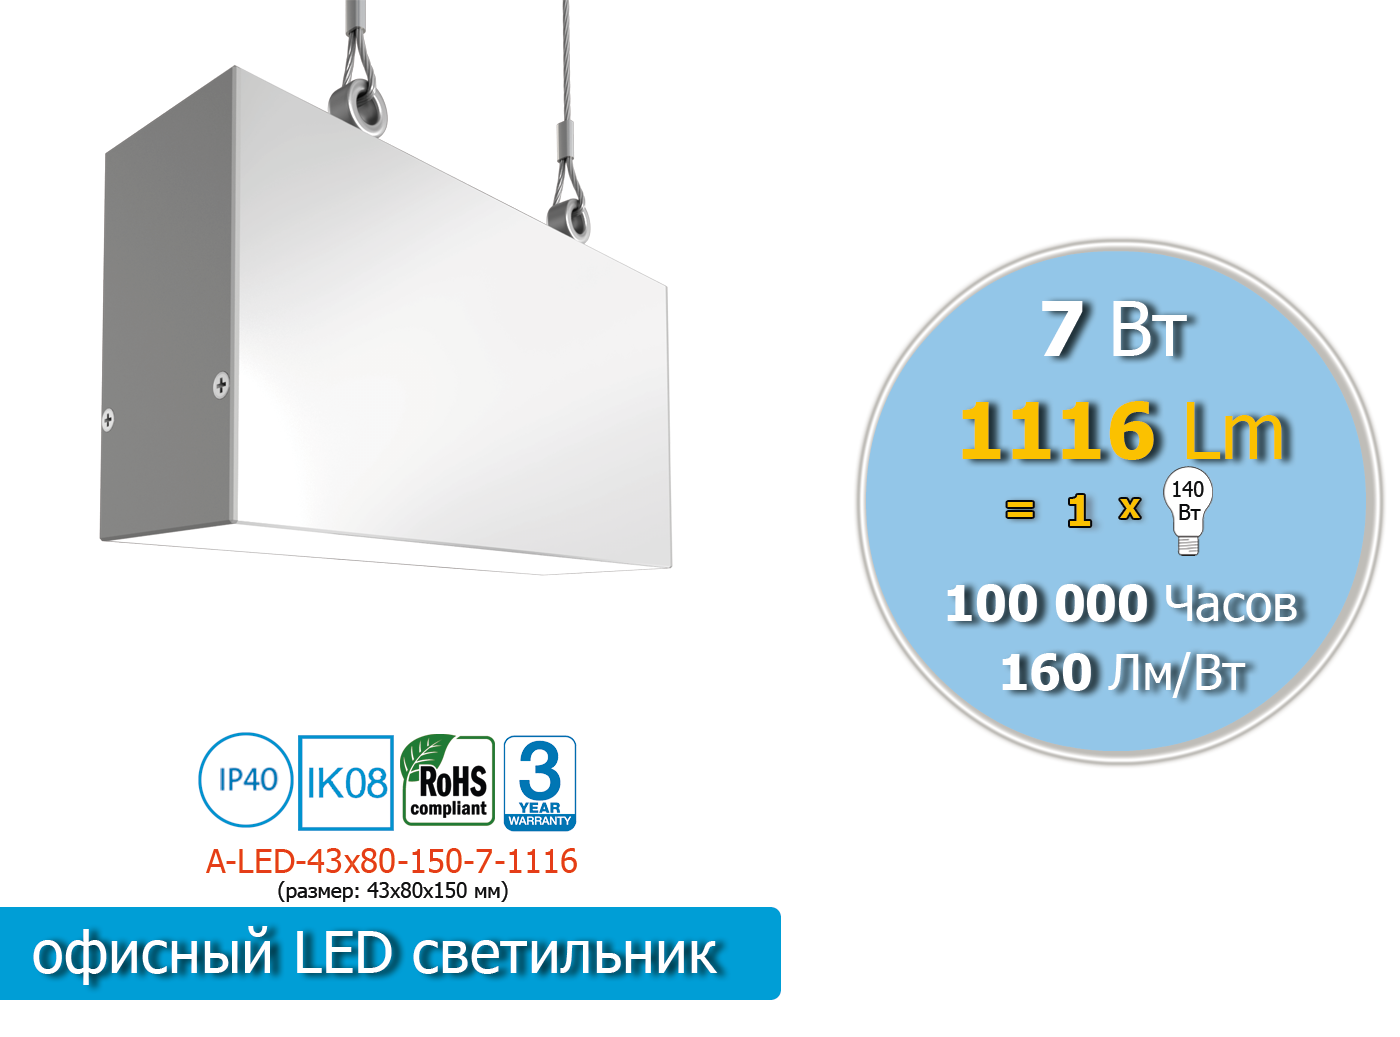 A-LED-43х80-150-7-1116